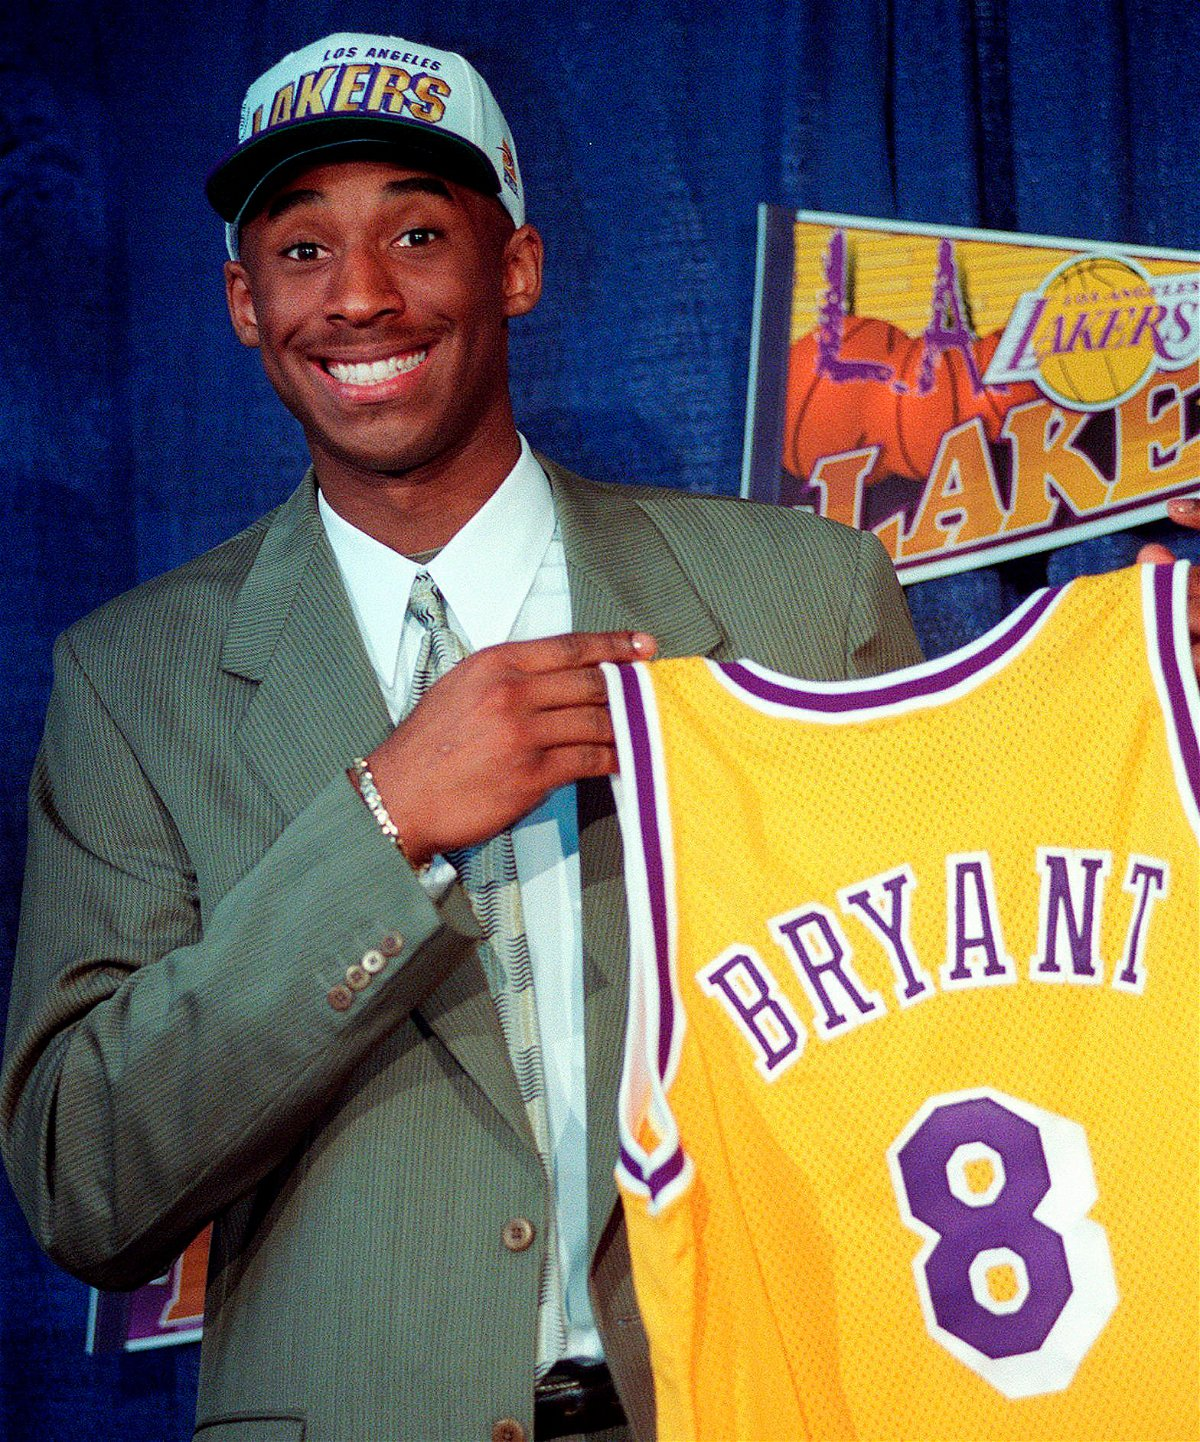 Why Did Kobe Bryant Choose No. 8 to